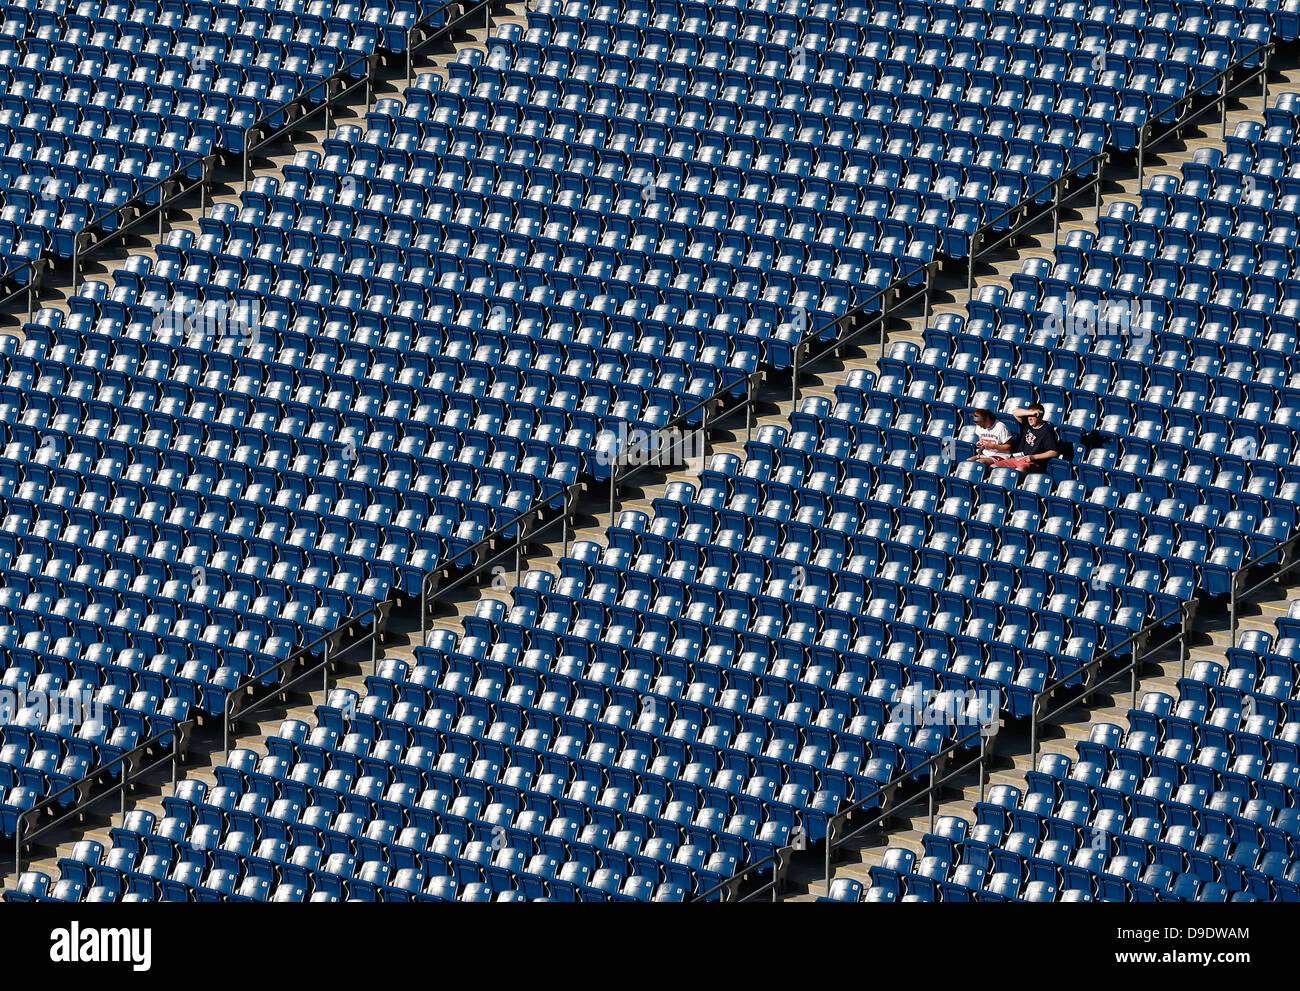 two people sitting in empty stadium - Stock Image